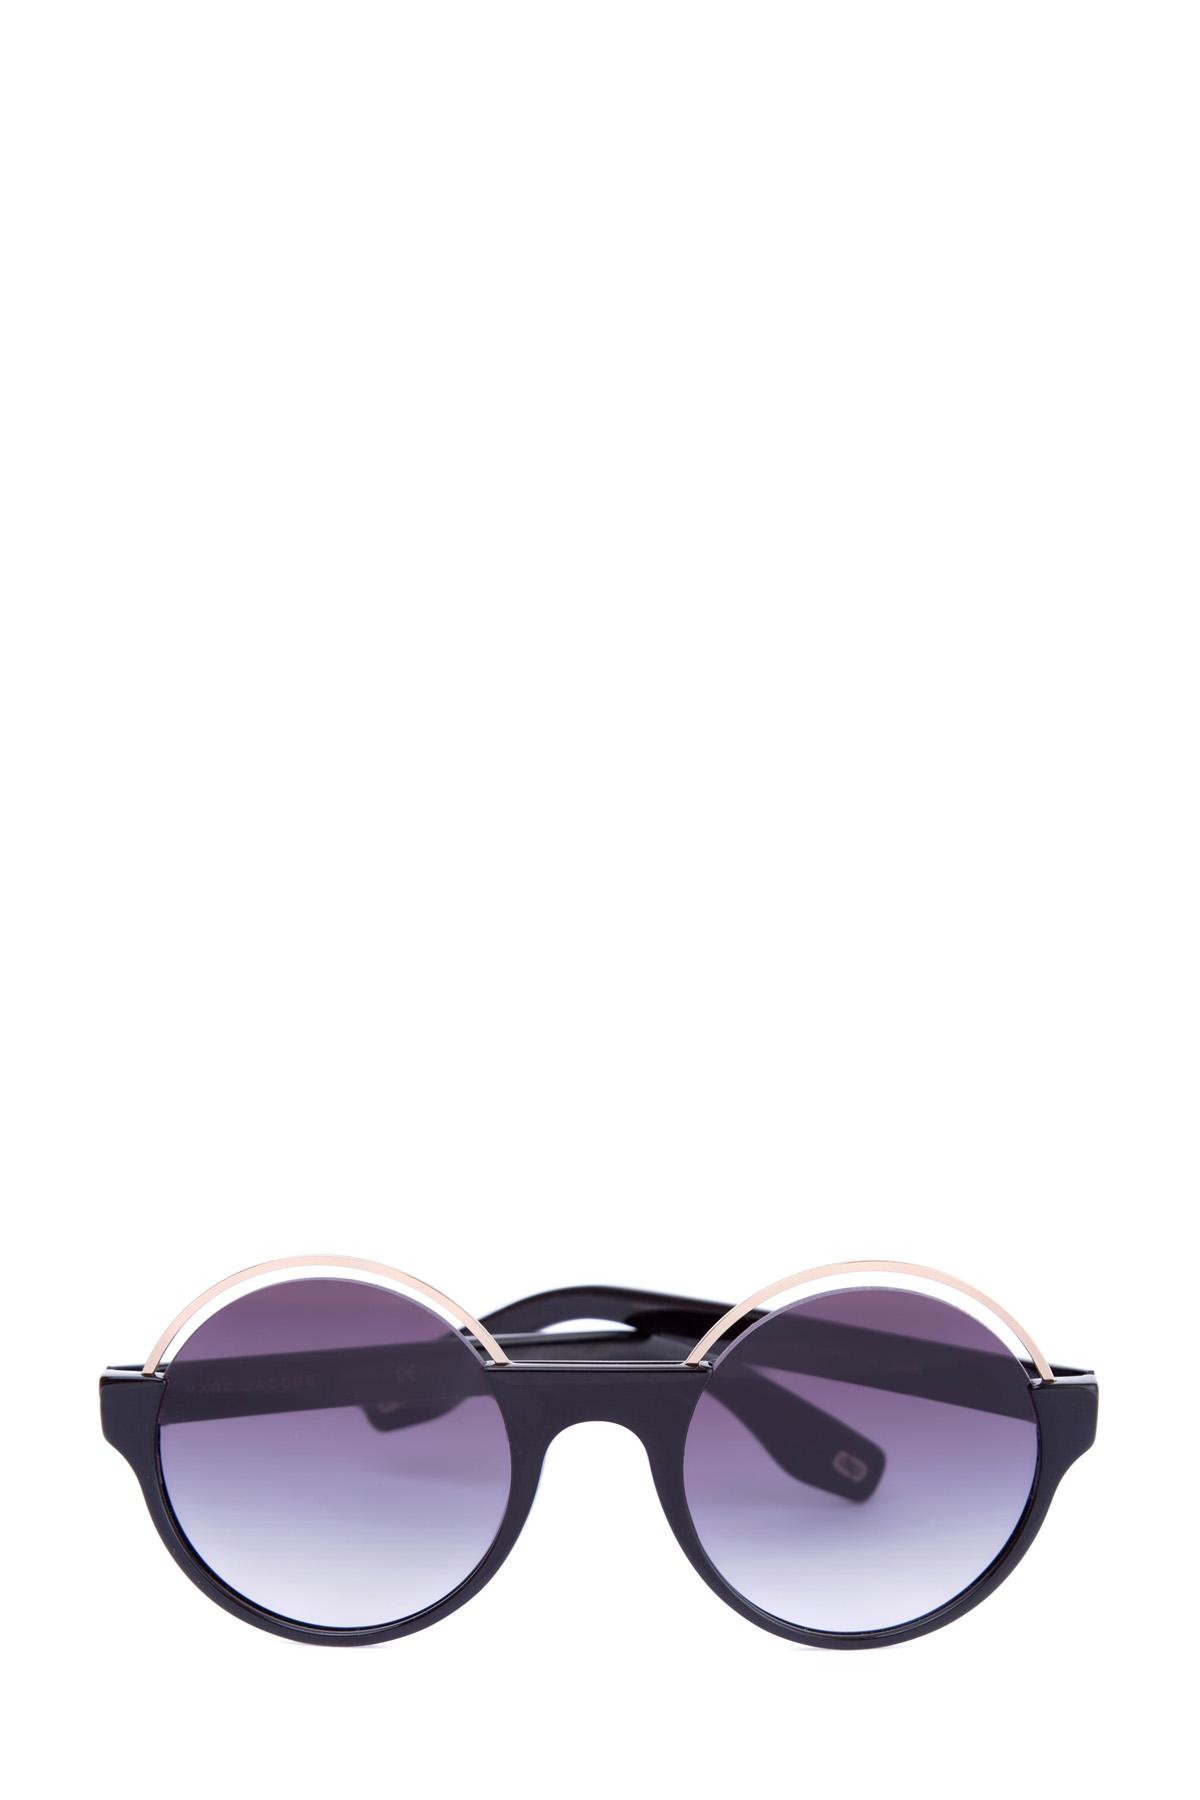 Купить Очки, MARC JACOBS (sunglasses), США, пластик 100%, стекло 100%